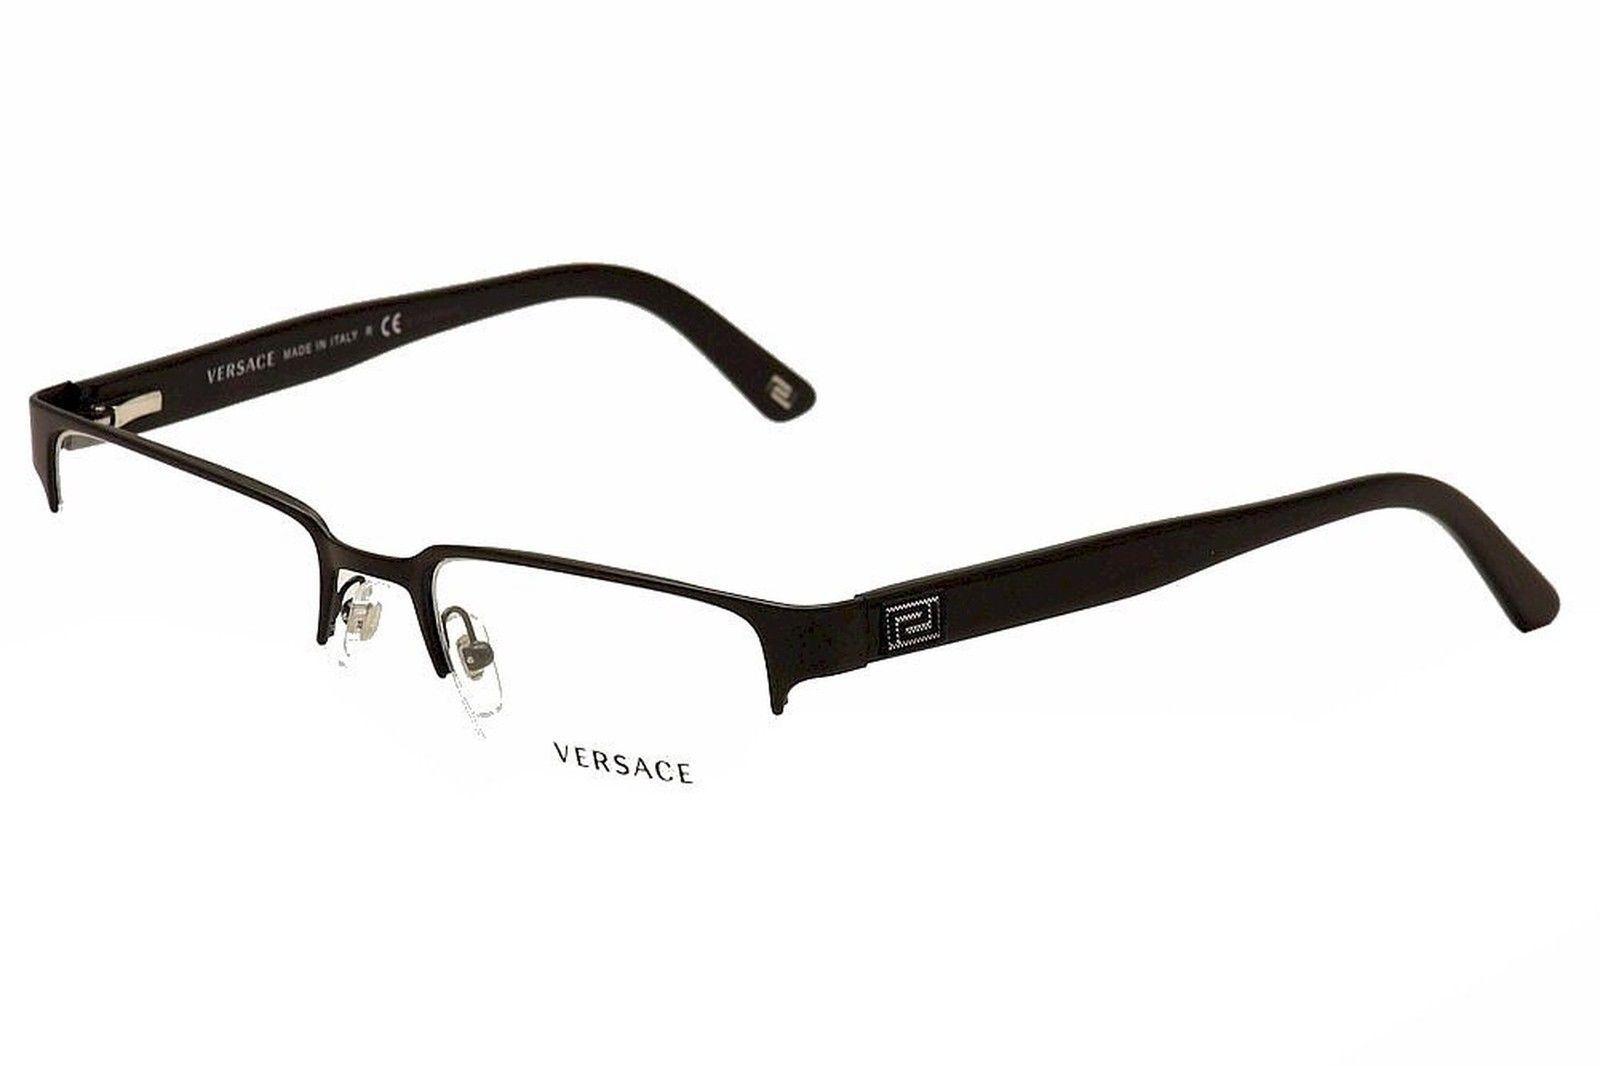 ebf53b36f88 Versace 0ve1184 Eyeglasses Matte Black 1261 Size 53mm for sale ...